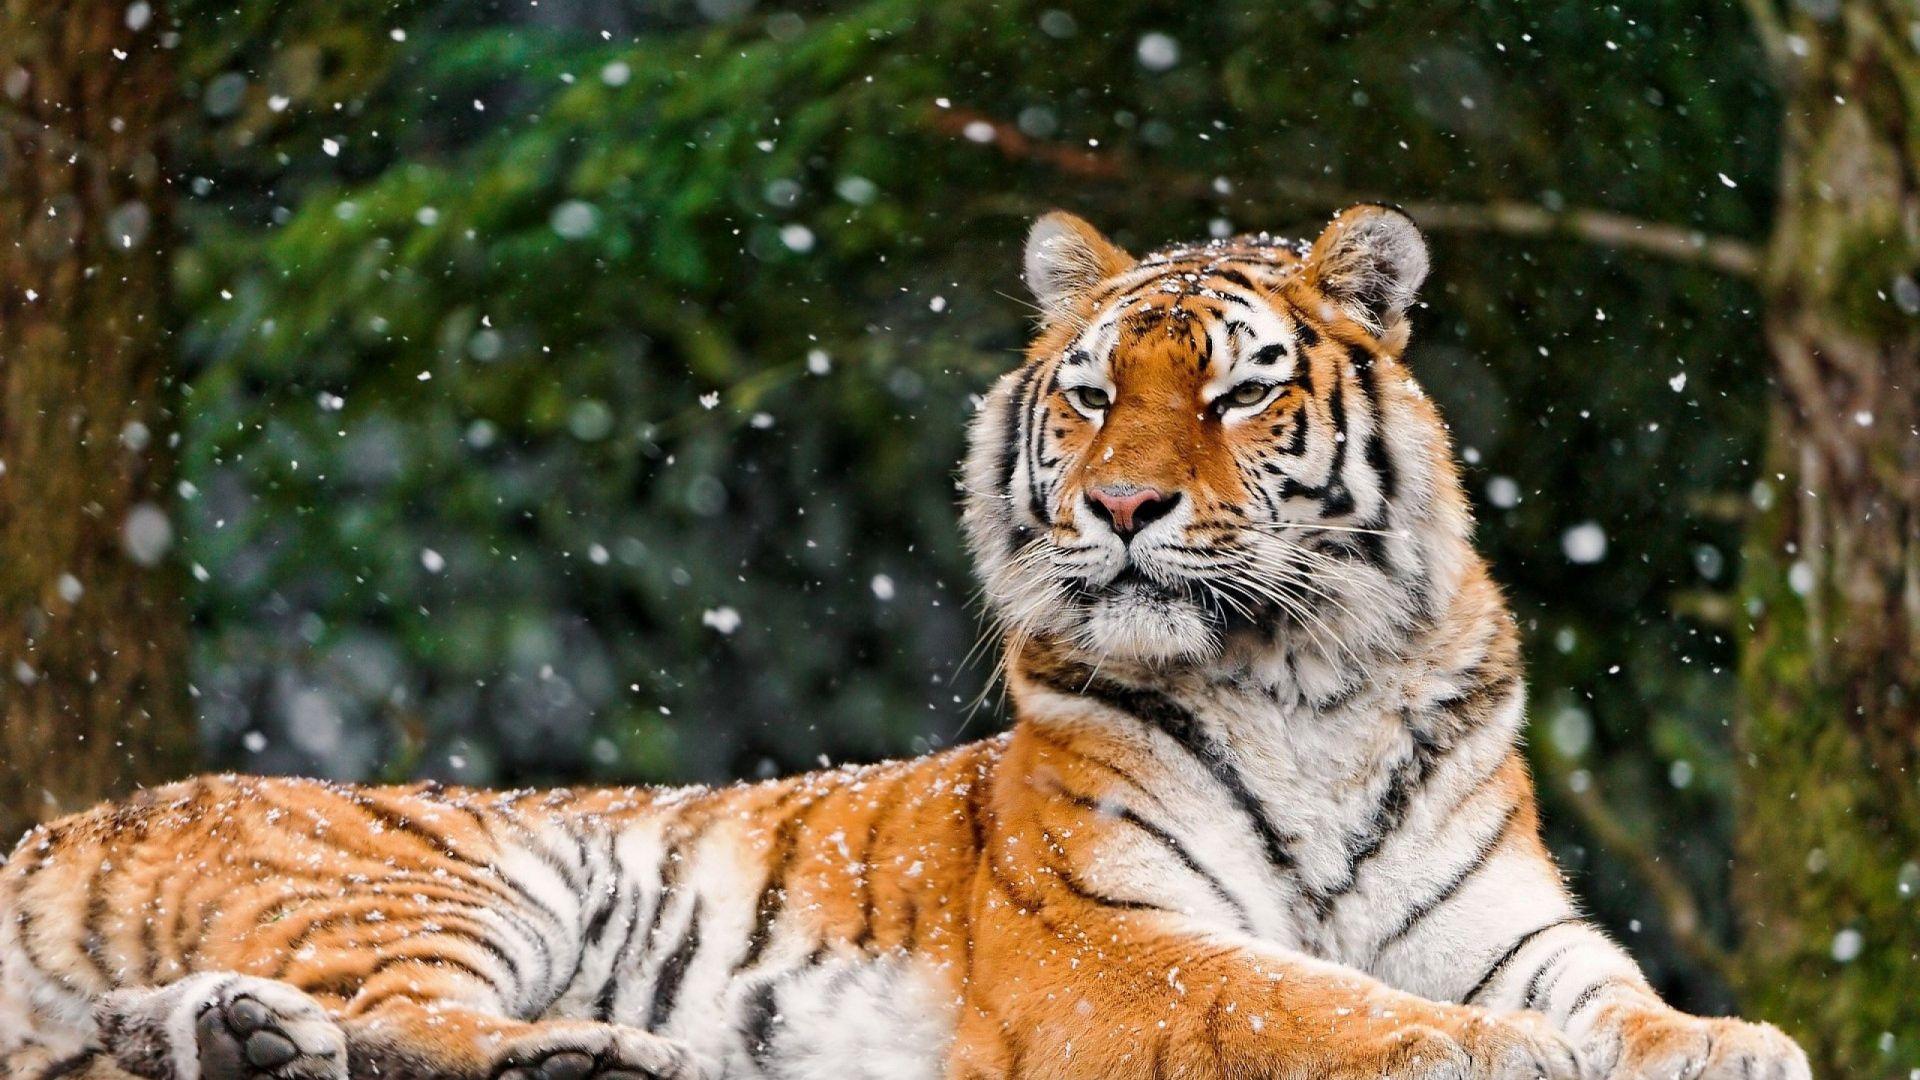 Download Wallpaper 1920x1080 Tiger Snow Lying Animal Full Hd 1080p Hd Background Tiger Wallpaper Animal Wallpaper Animals